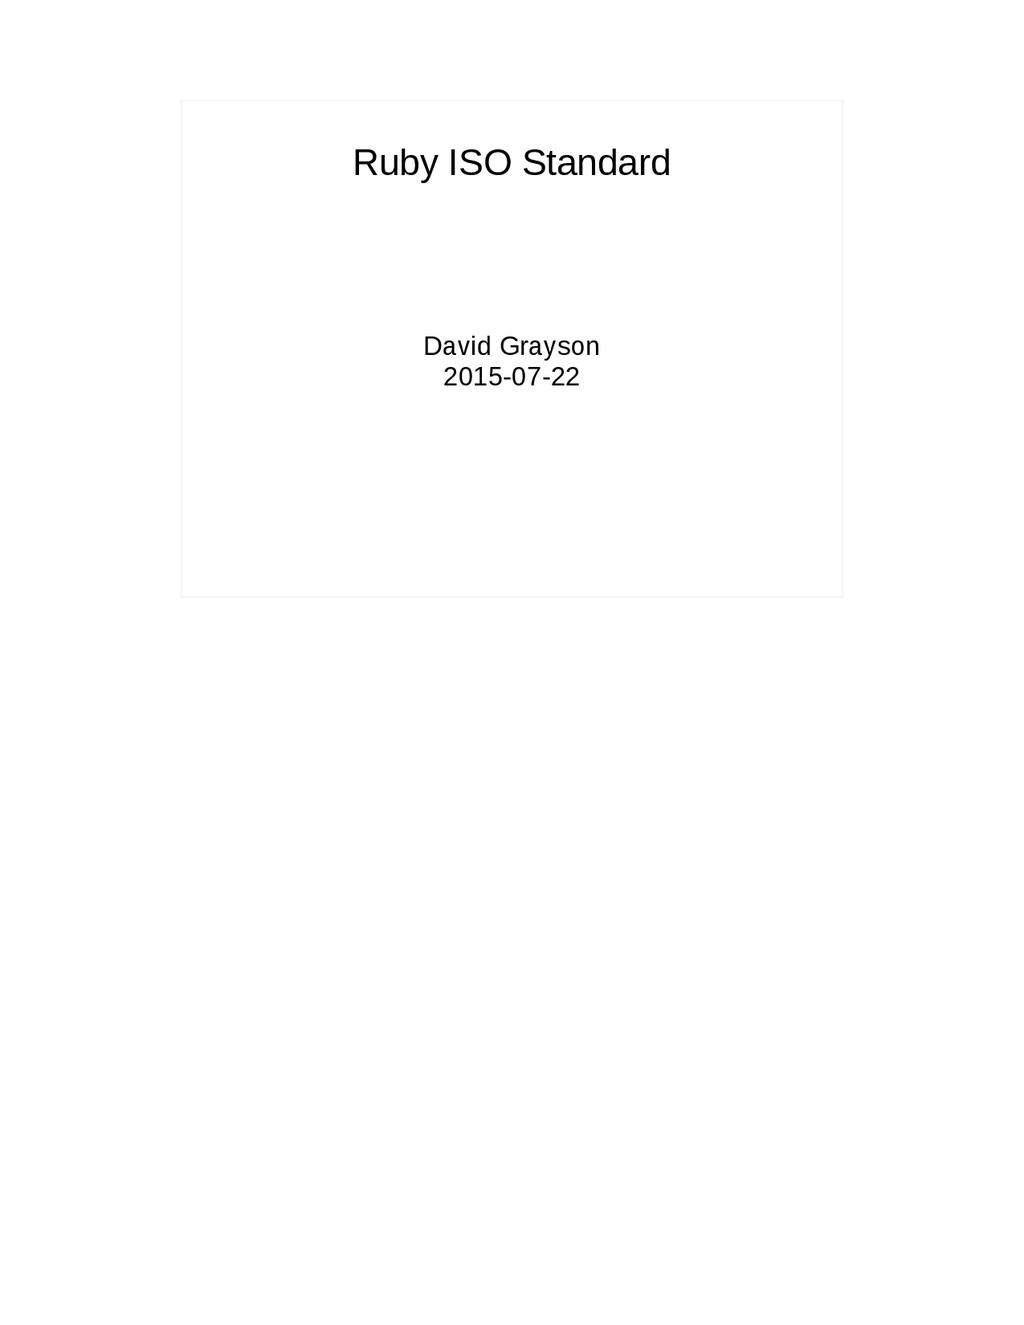 Ruby ISO Standard David Grayson 2015-07-22